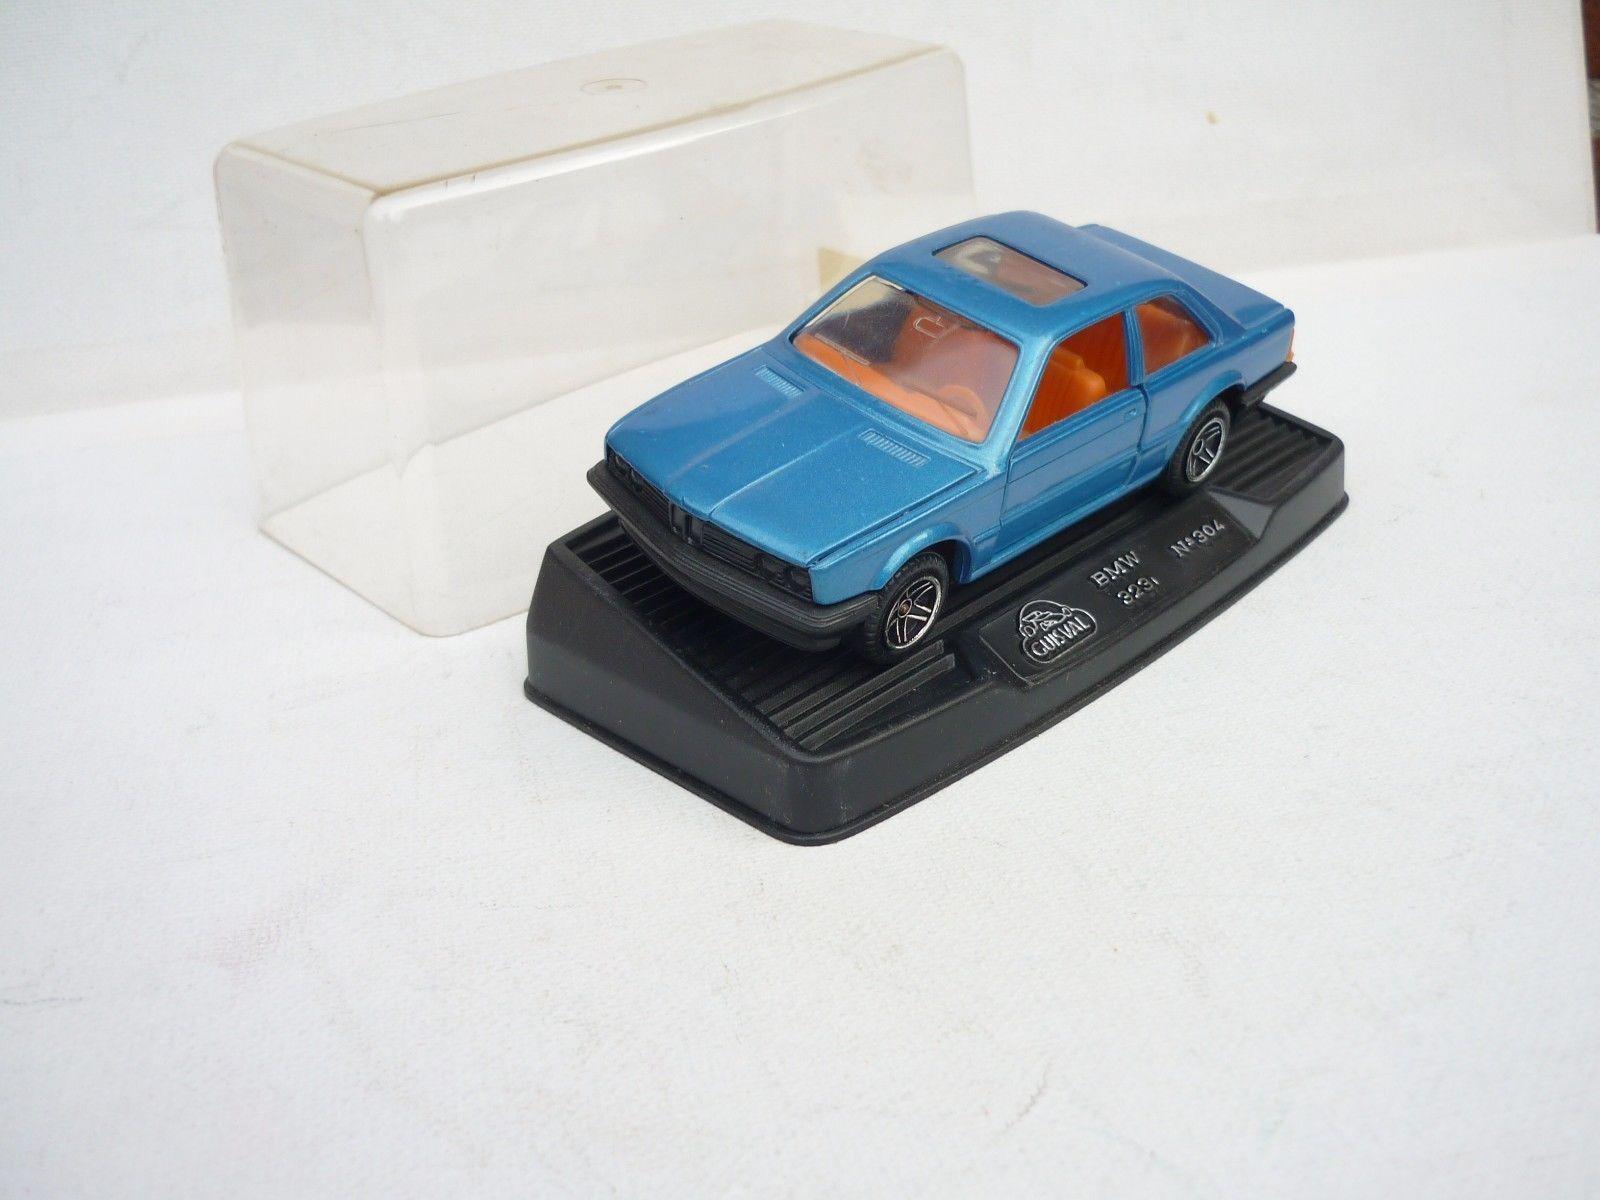 GUISVAL BMW 323 I 1 43 VINTAGE SPAIN SPAIN SPAIN MADE series M BOX RARO SUPER SELTEN    8136f0